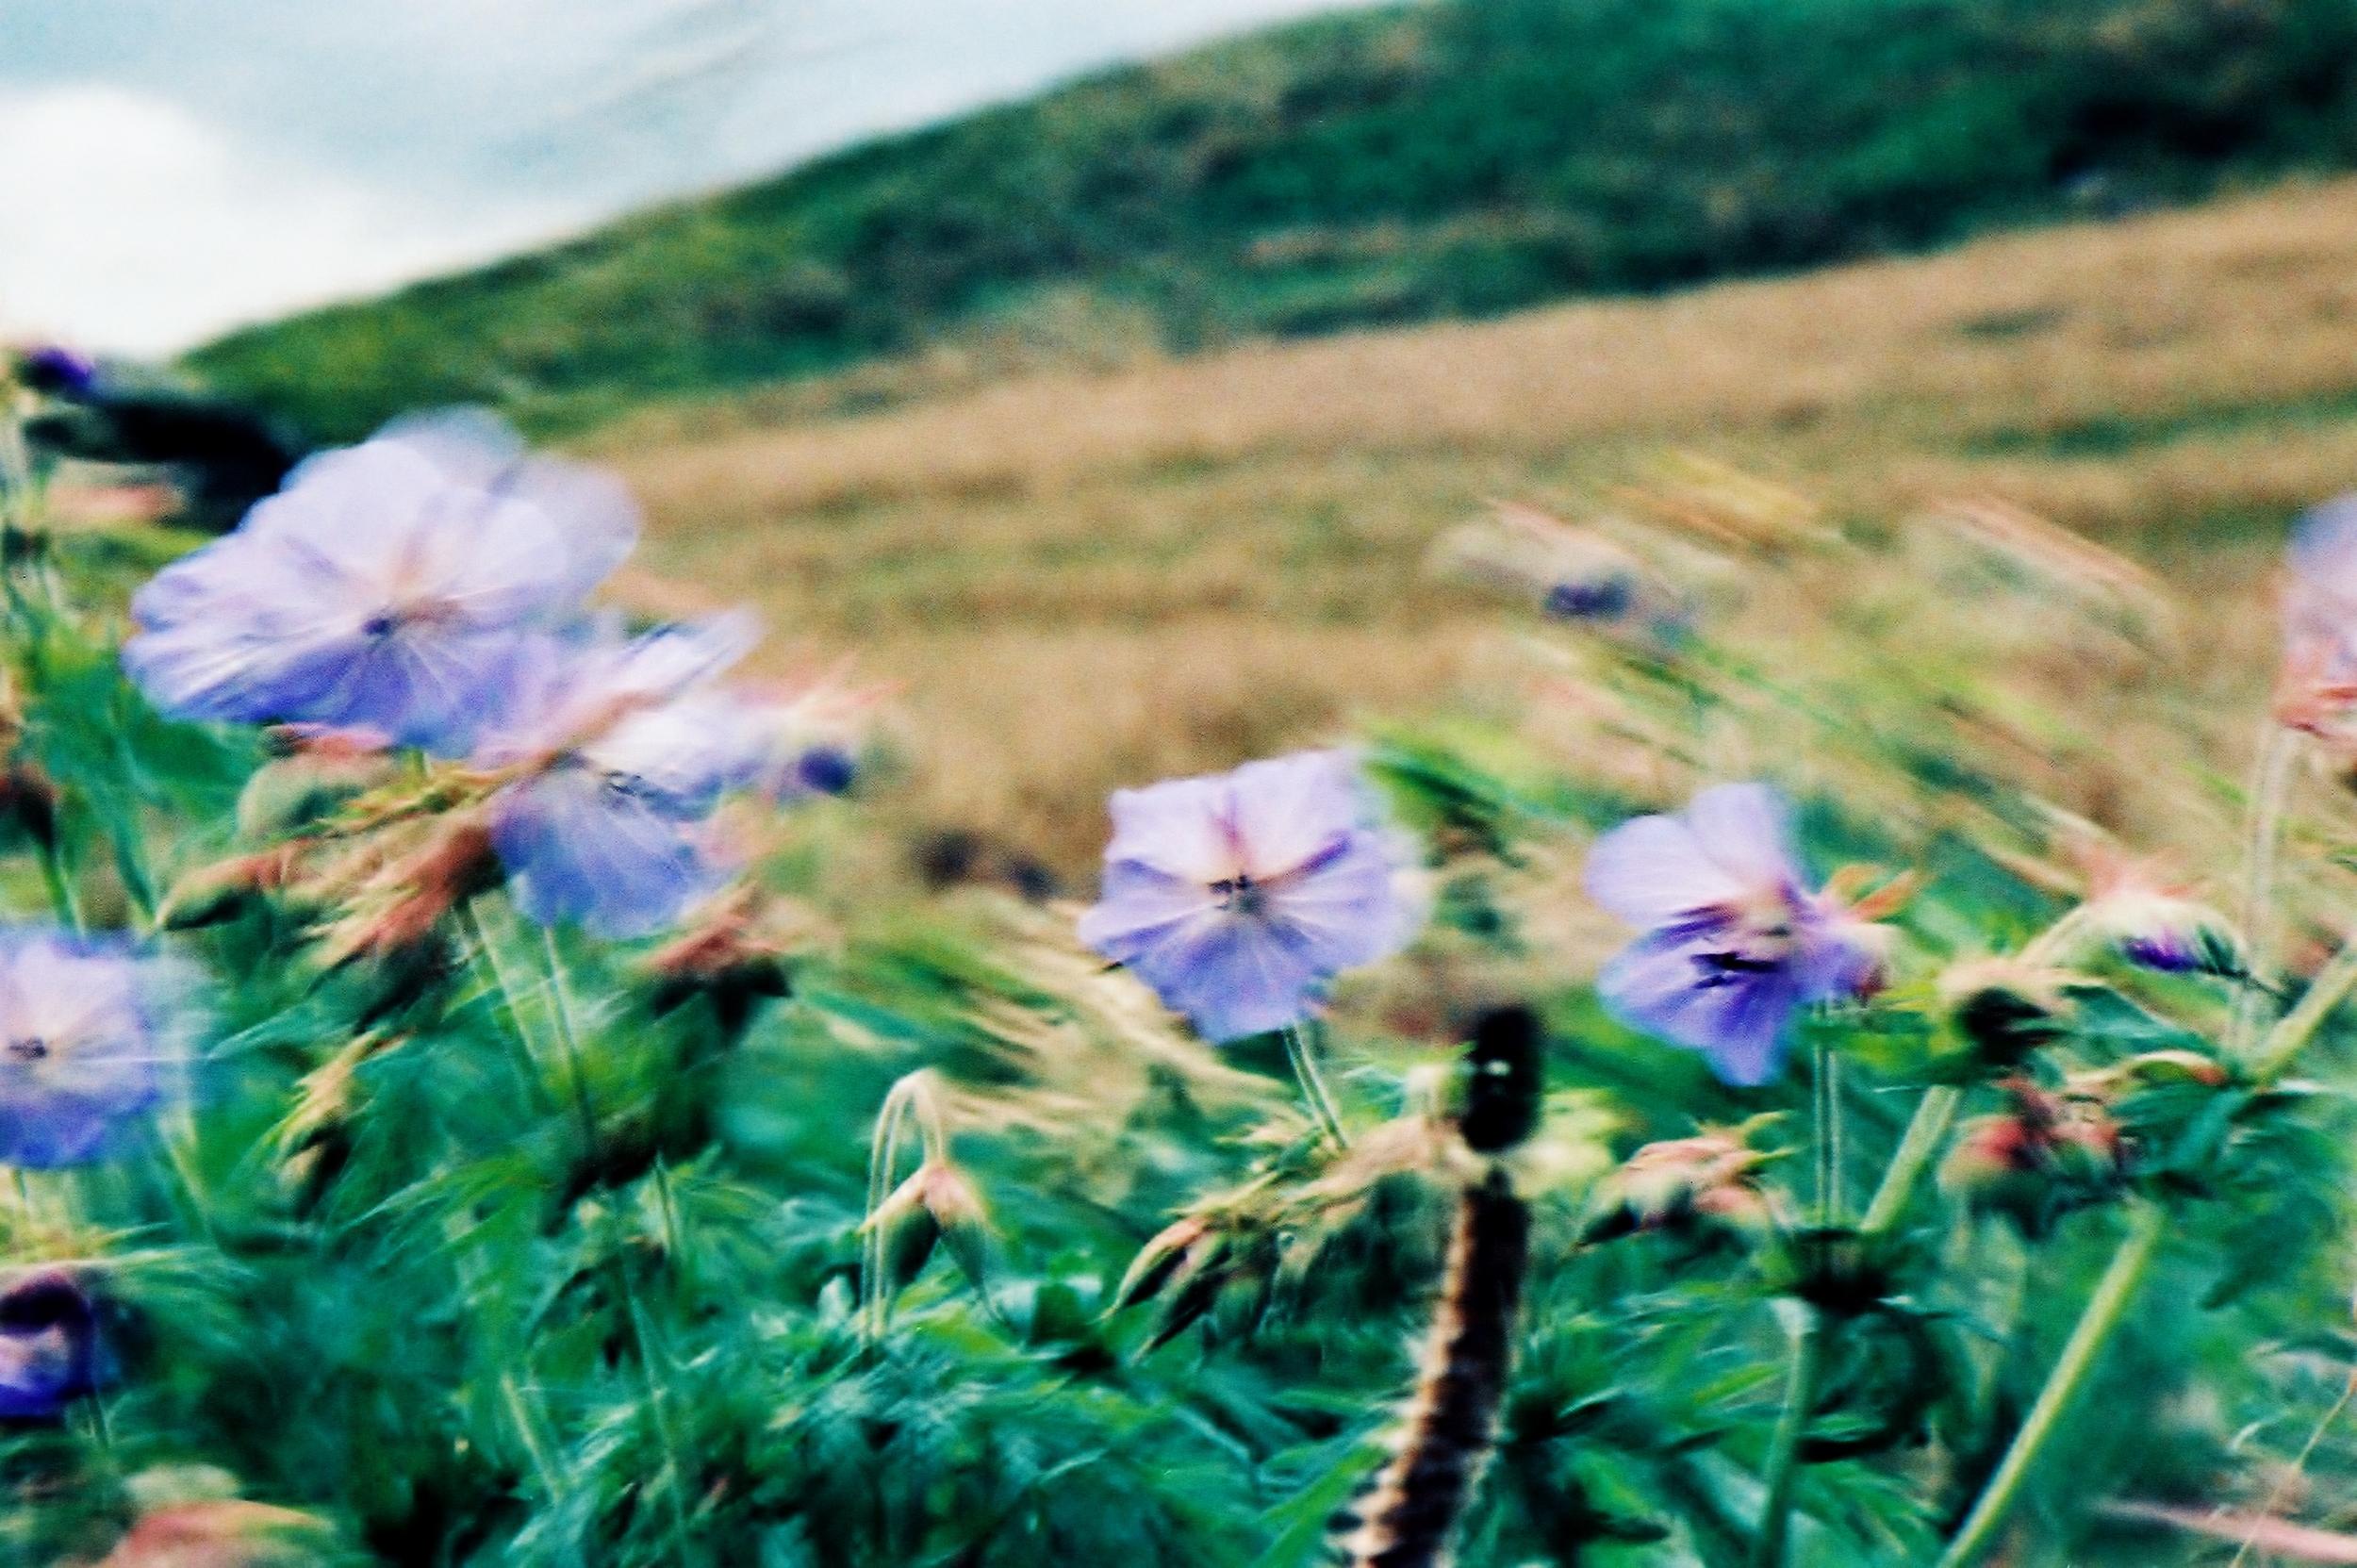 untitled | F90x | Sensia II xpro | Lucy Wainwright